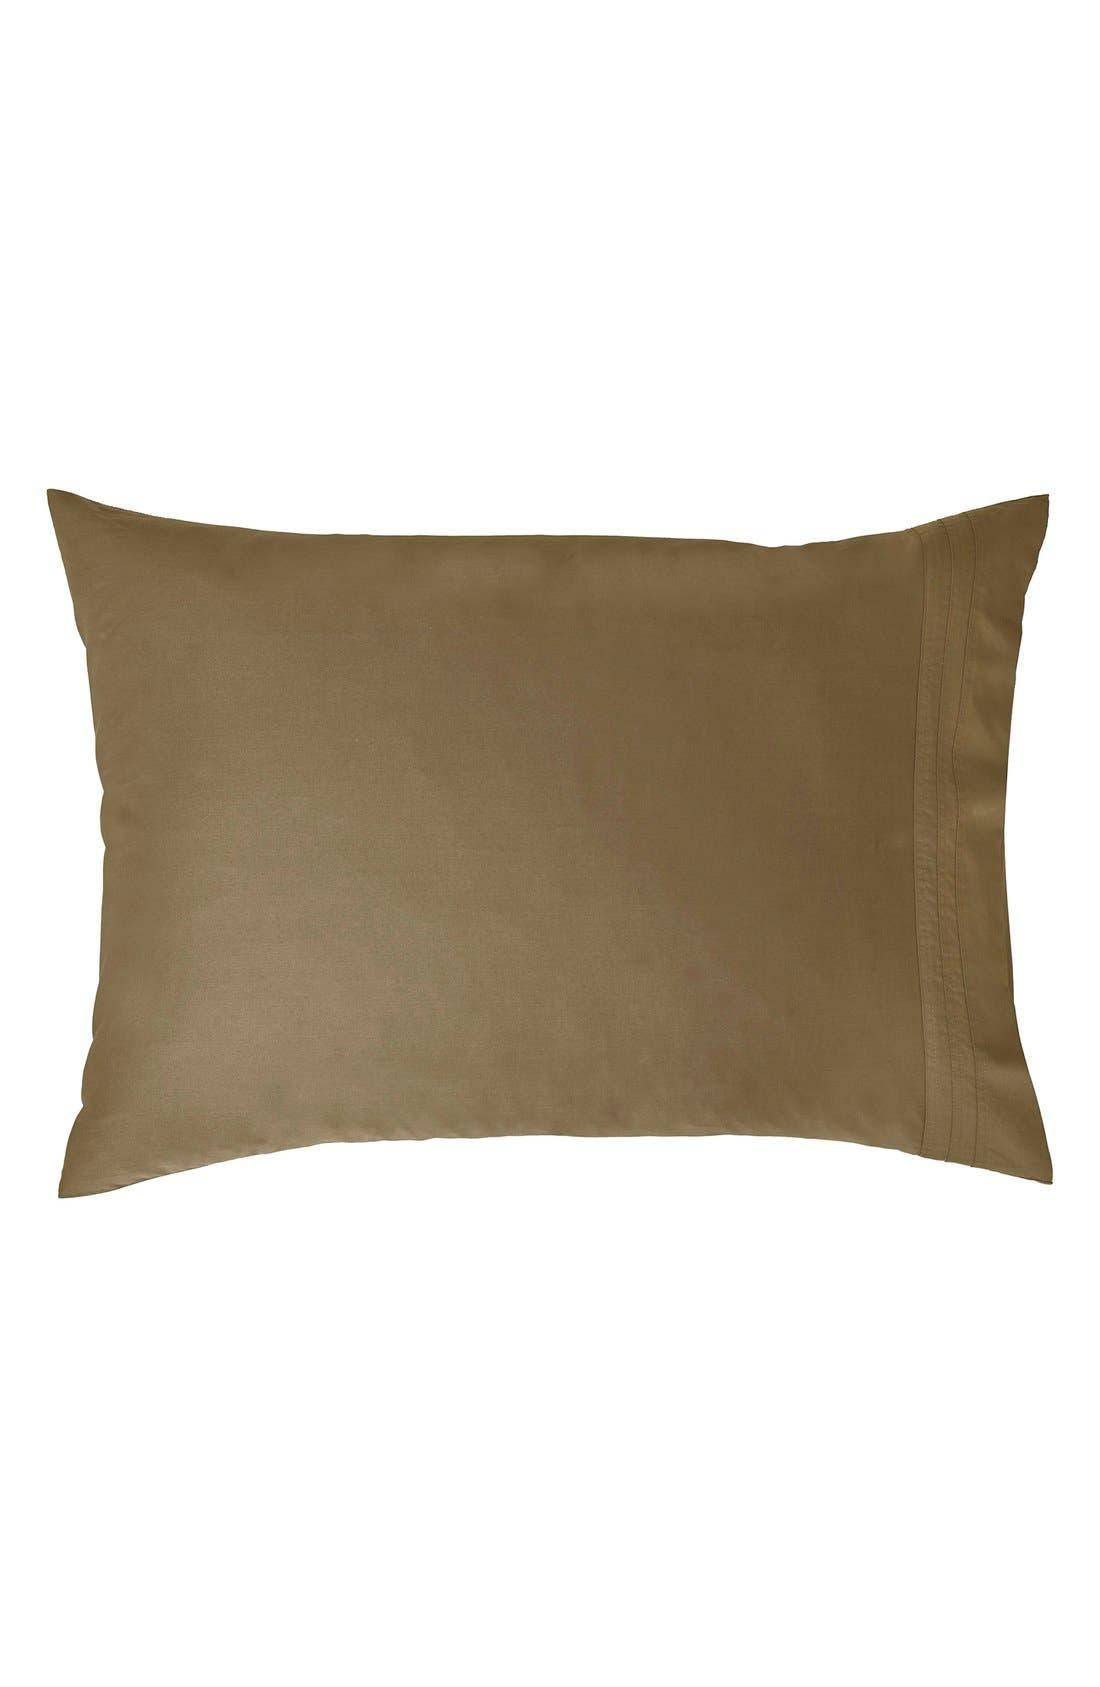 Donna Karan Collection 510 Thread Count Pillowcases,                         Main,                         color, Shiitake